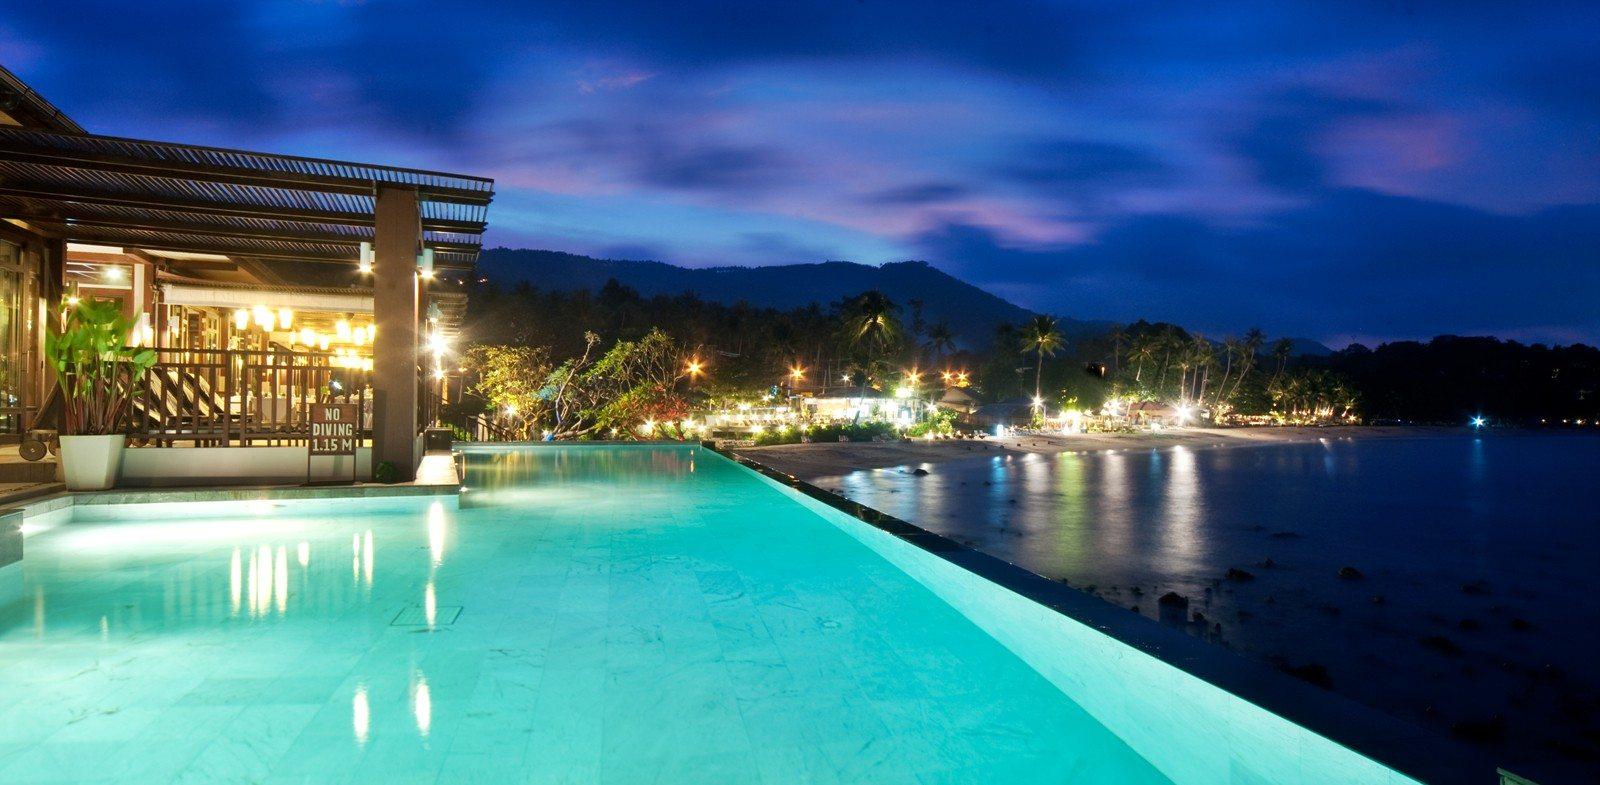 The Sarann Thailand Infinity Pools